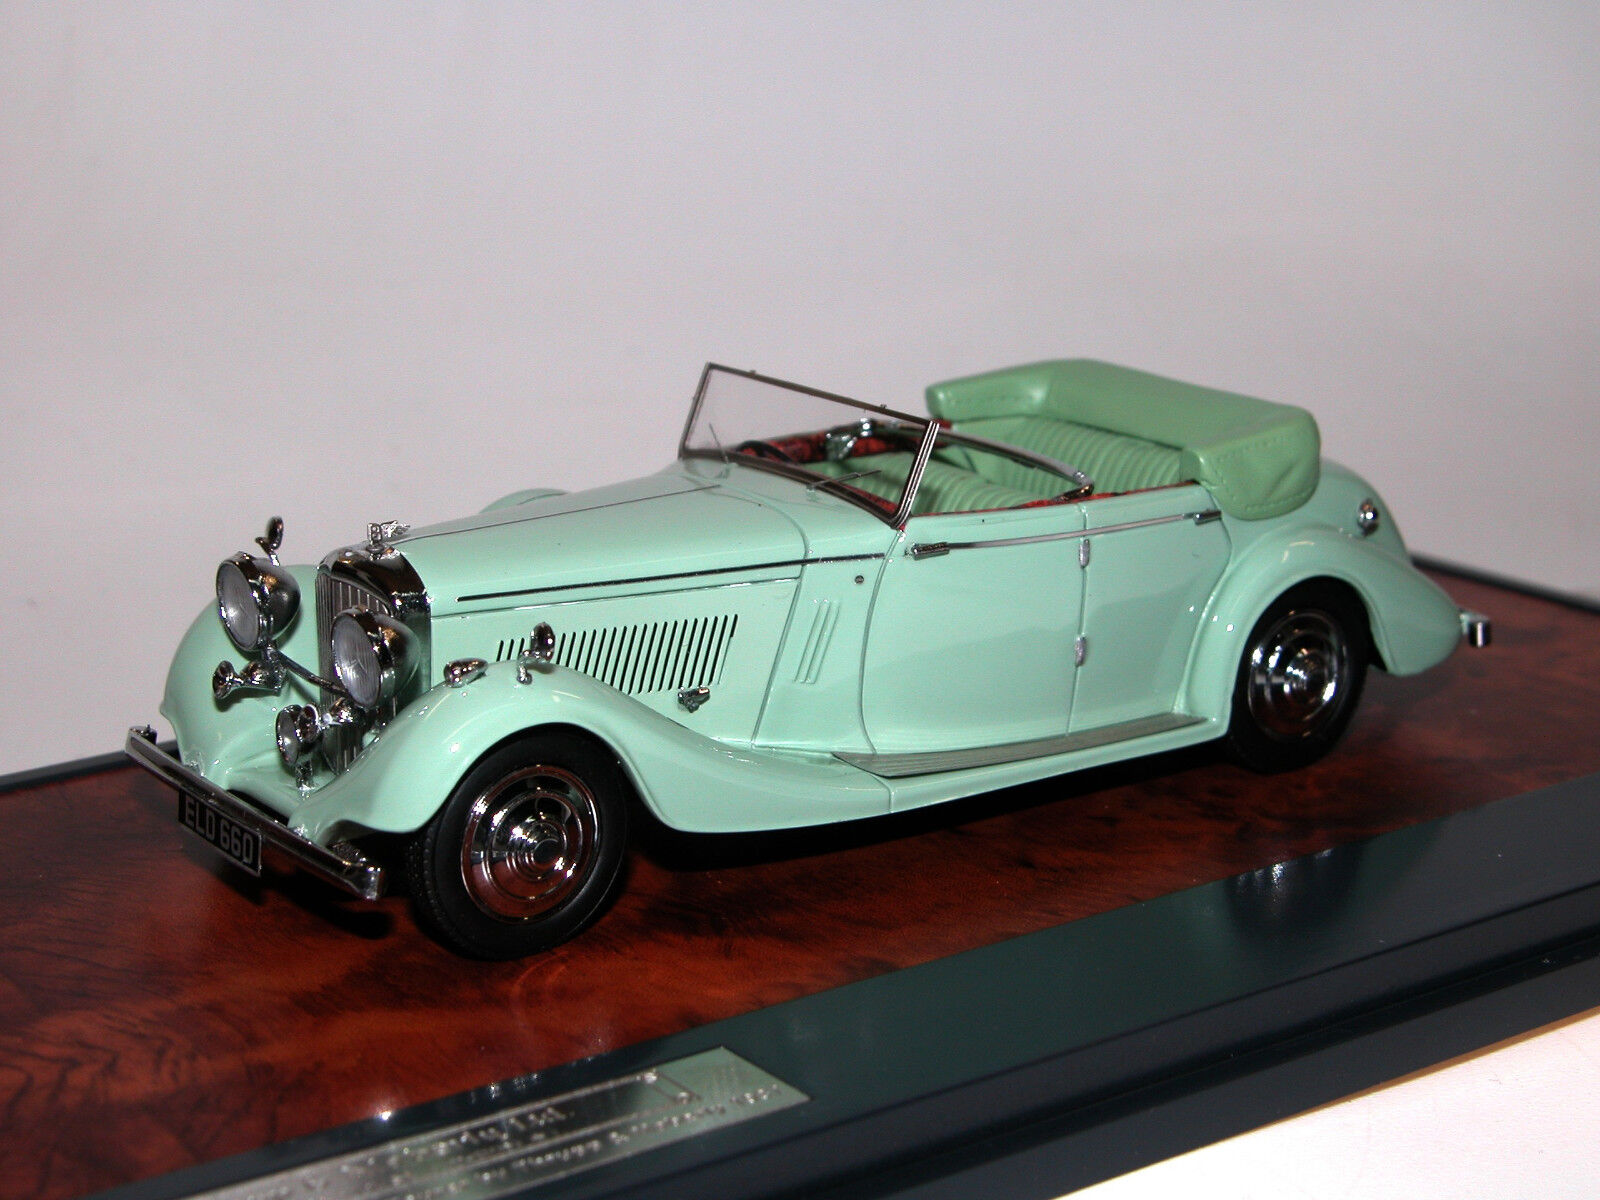 Matriz, 1937 Bentley 4.25 litre Thrupp & Maberly all-Weather Tourer, verde, 1 43